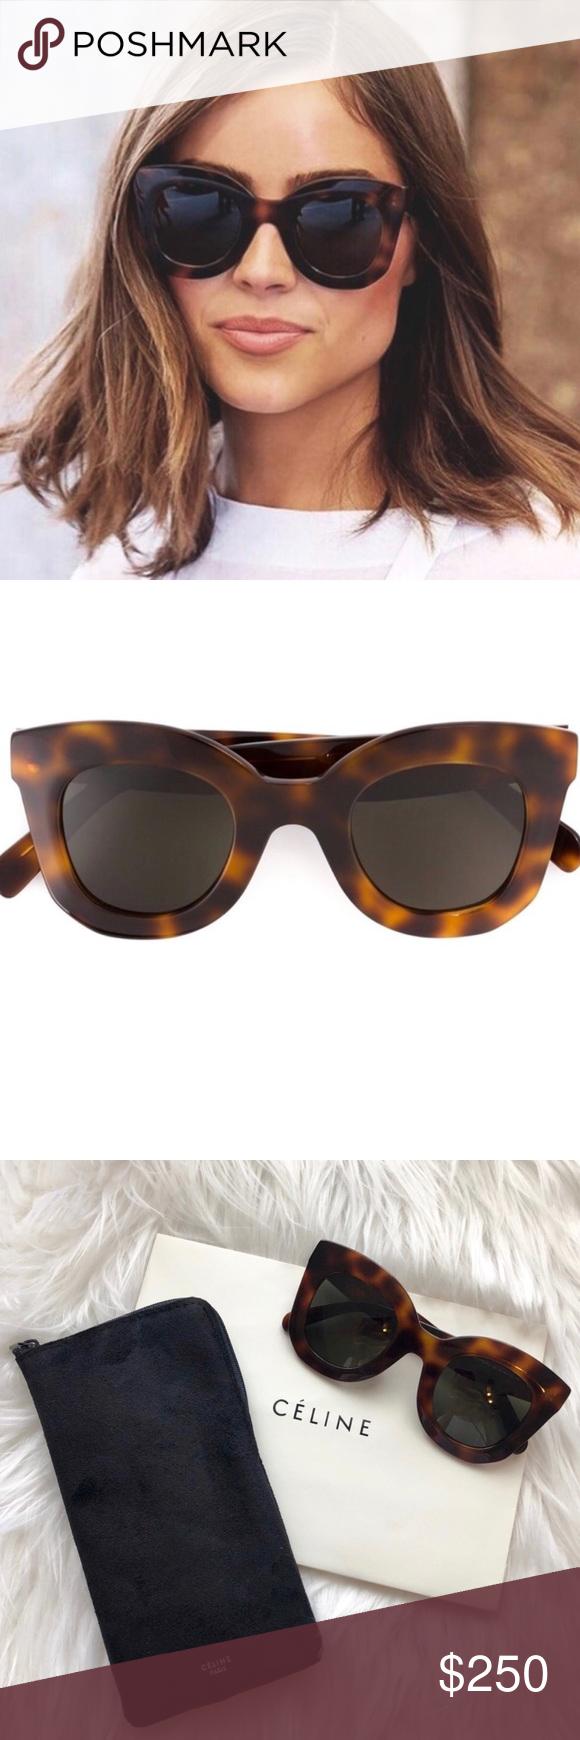 4d7ef46f59 Havana frame with Dark Grey lenses. Brand new. Includes original Céline  gift box